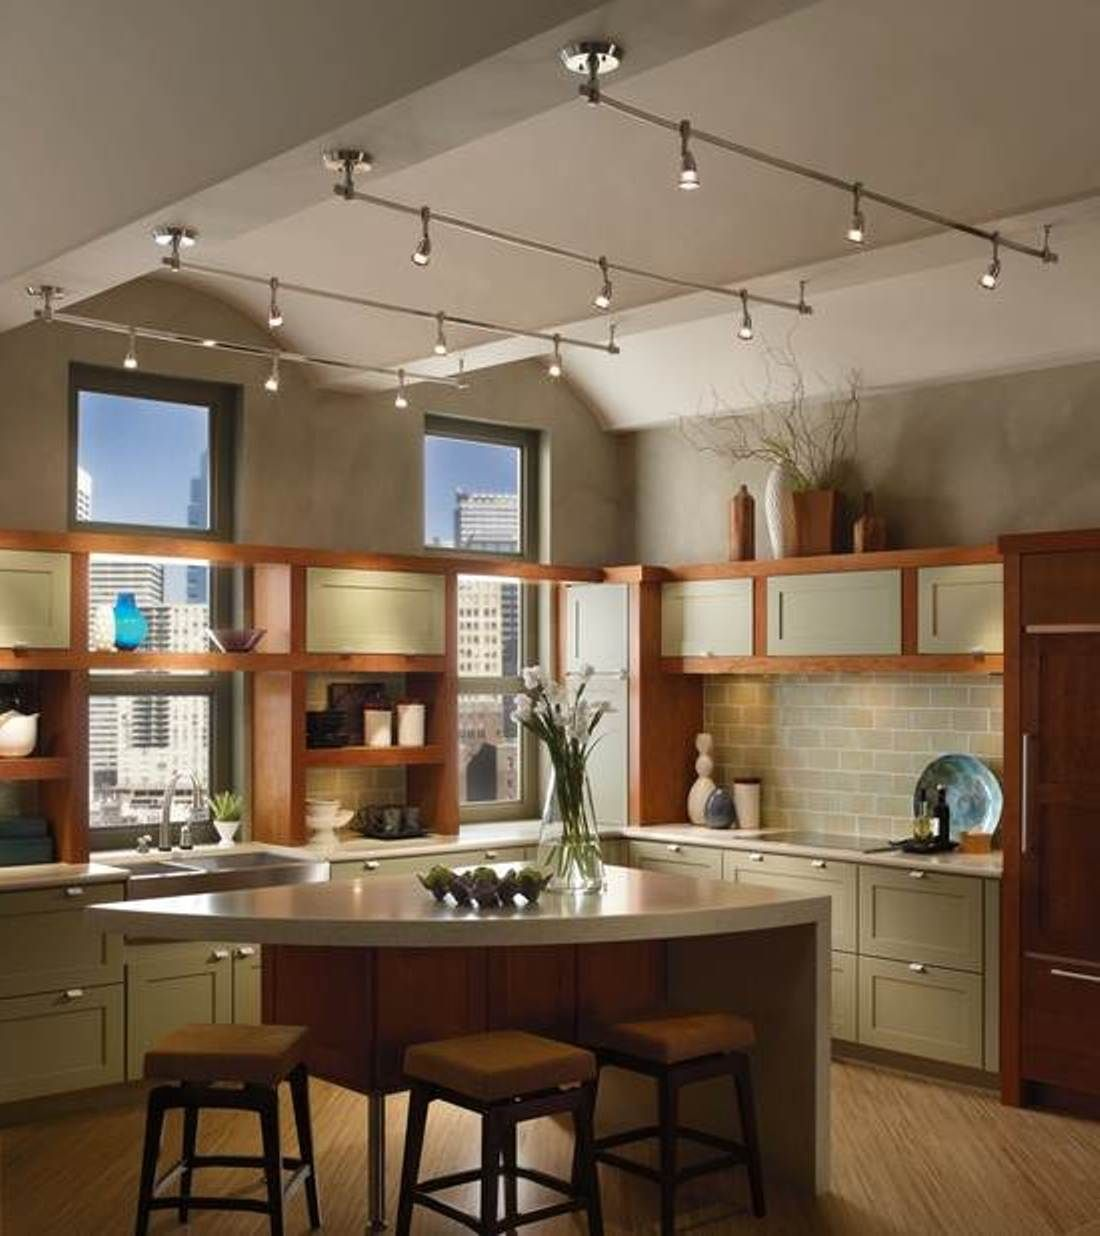 decorative track lighting kitchen kitchens painted orange best 25 43 ideas on pinterest